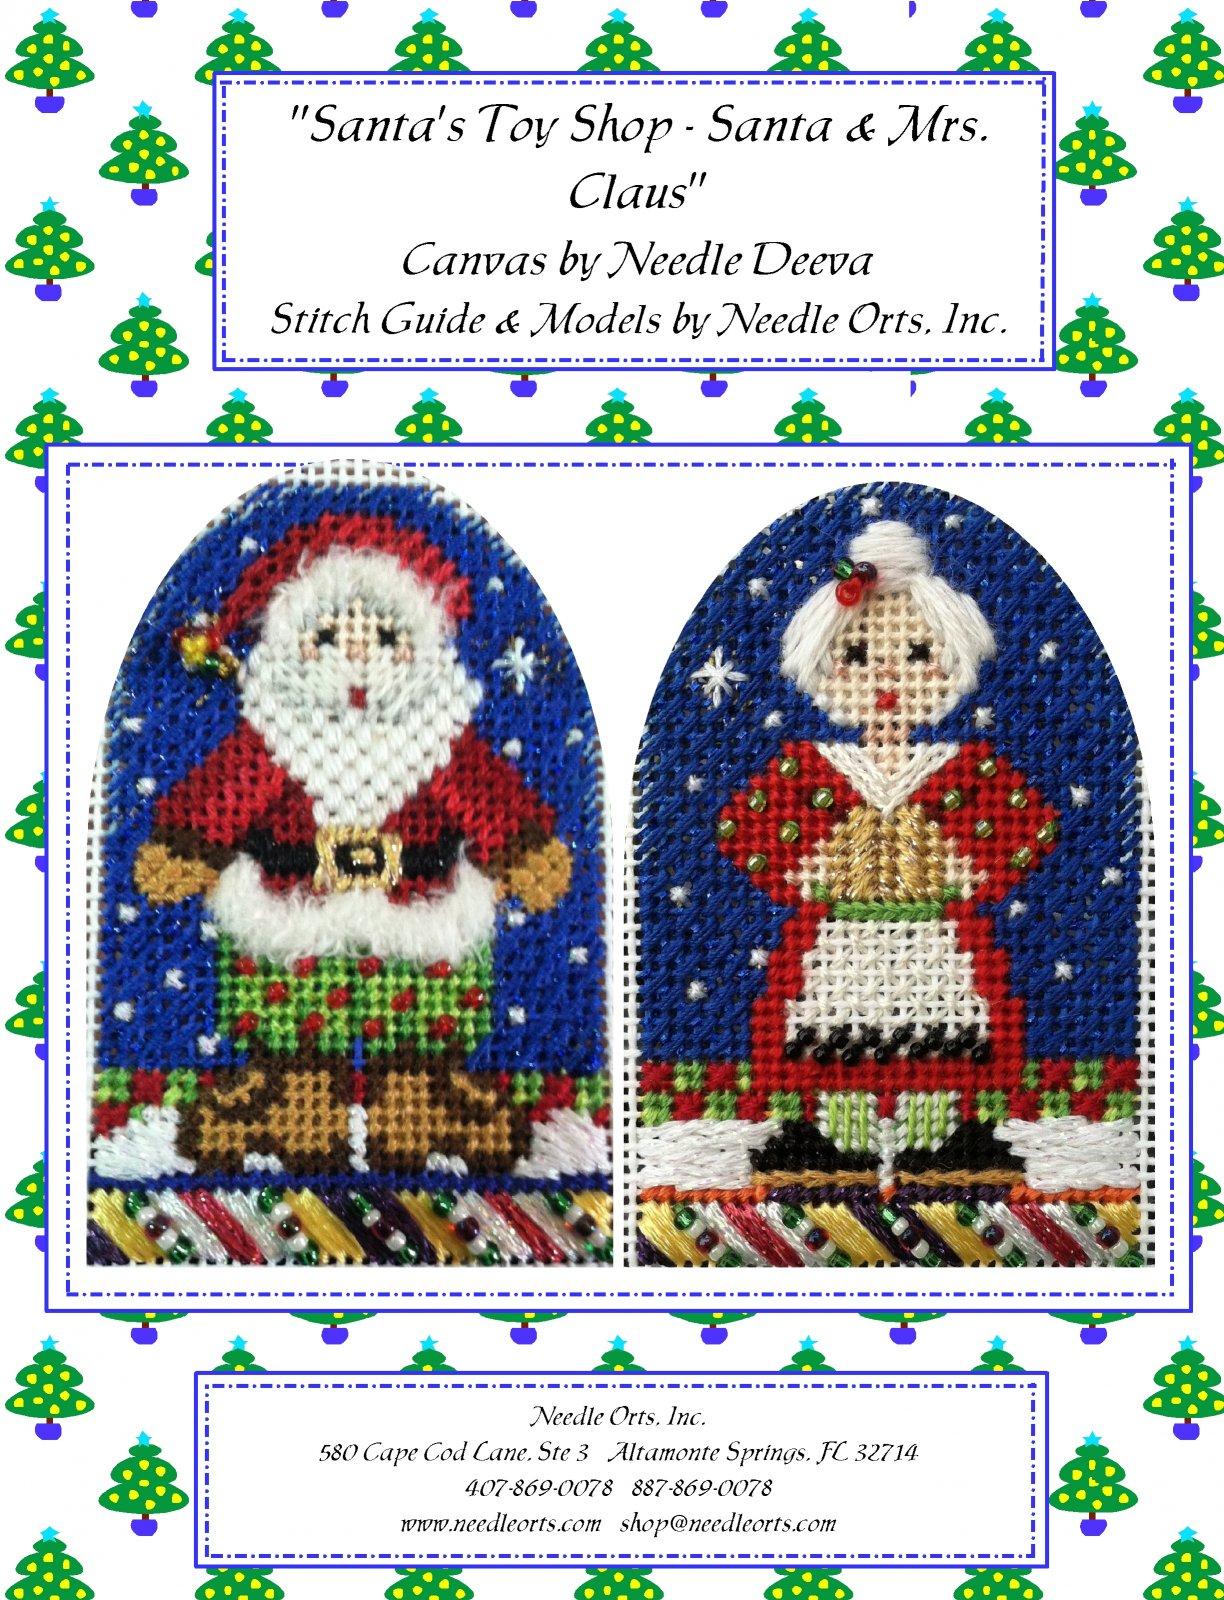 Stitch Guide - Santa's Toy Shop:  Mr & Mrs. Claus